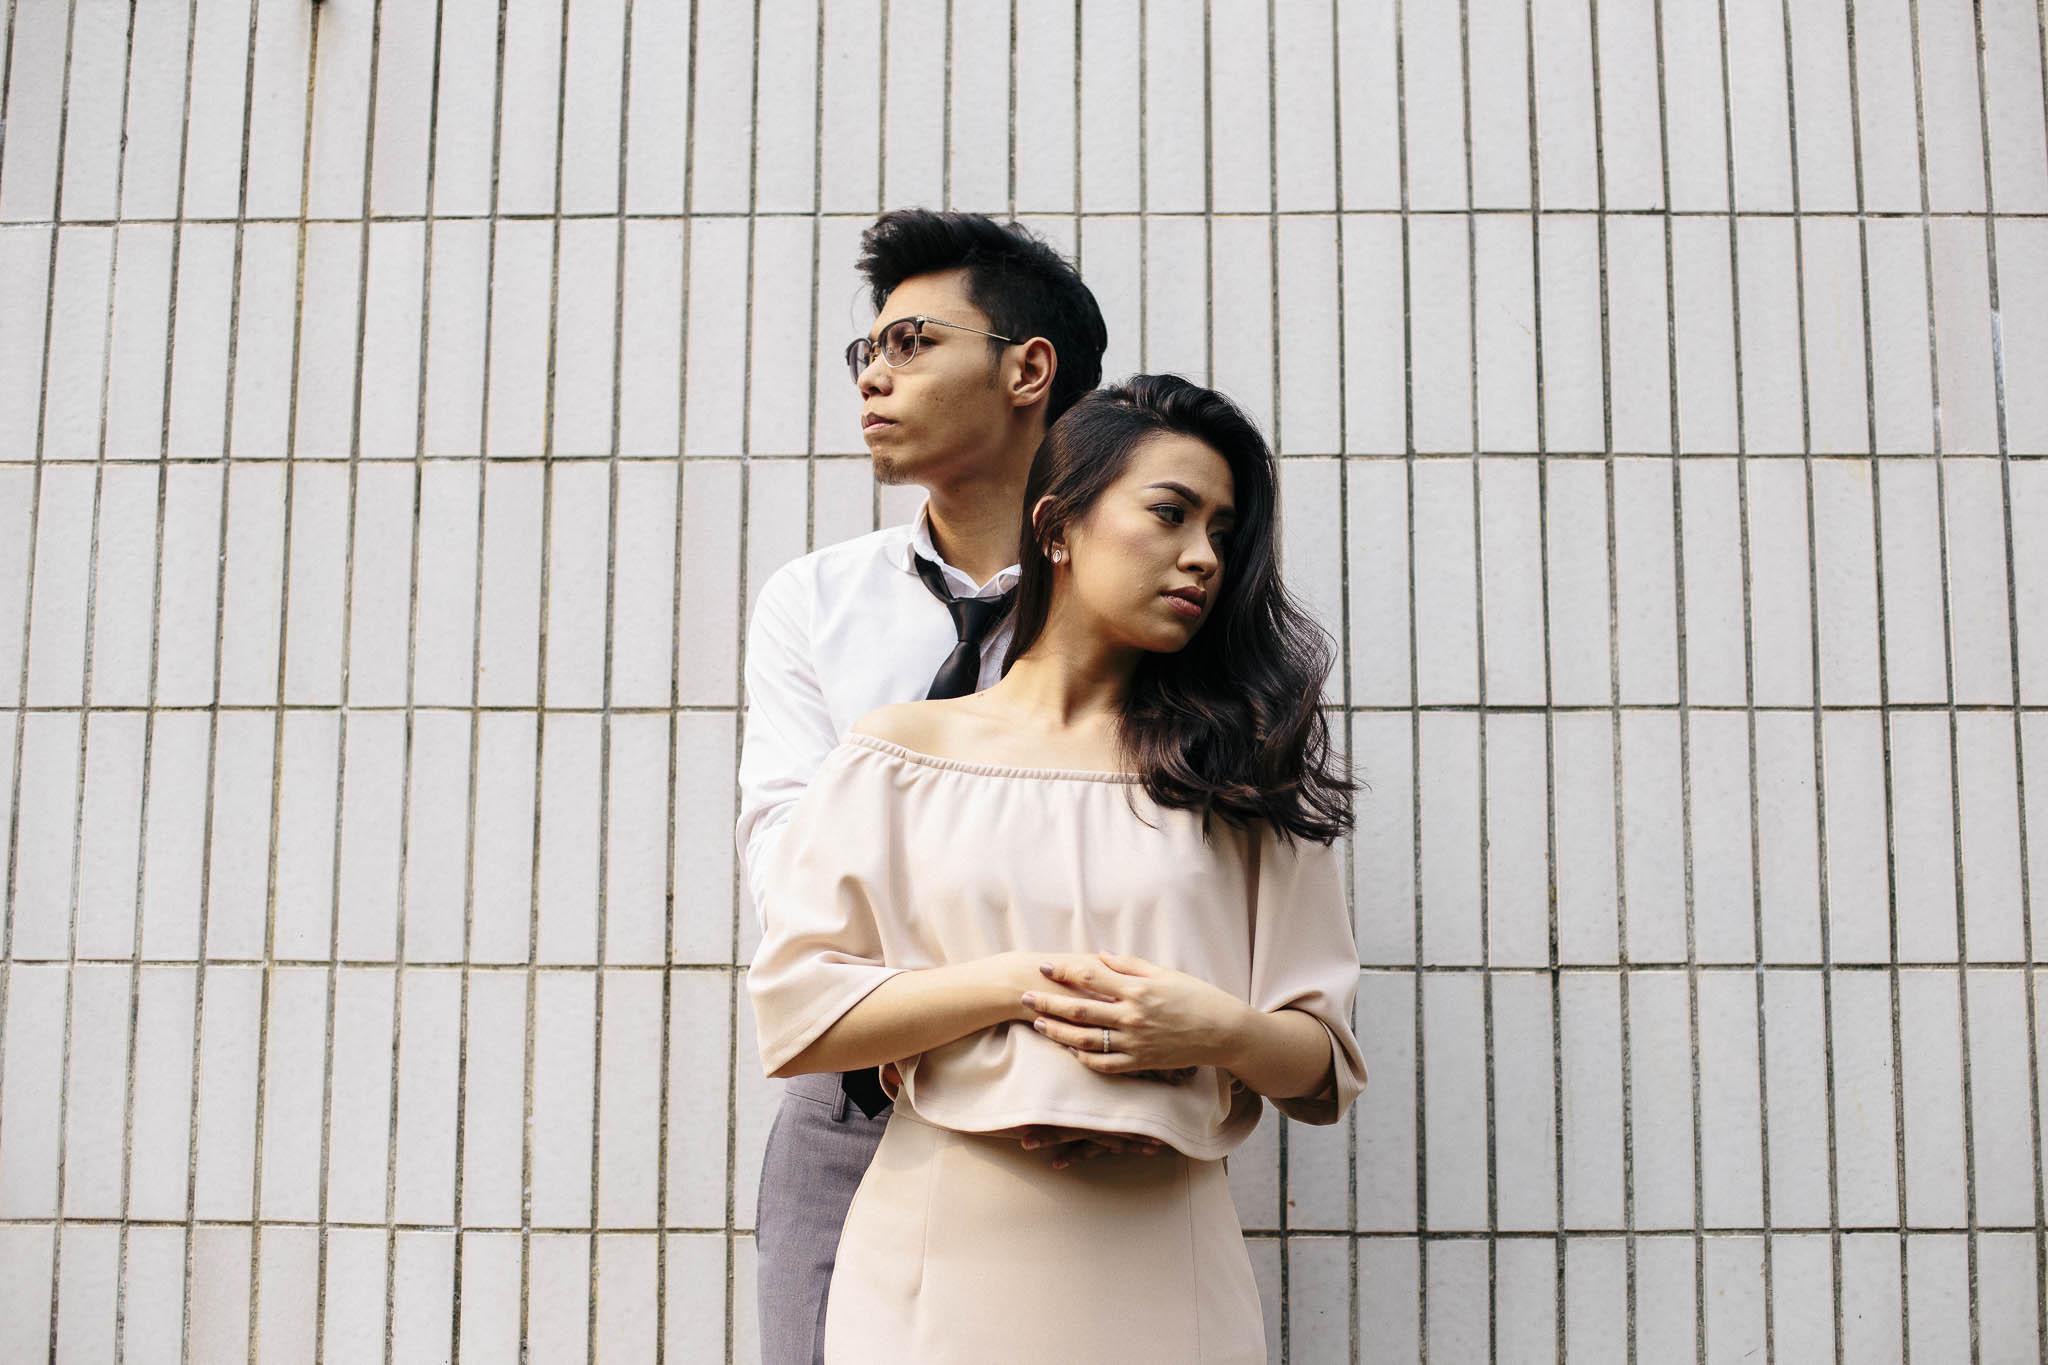 singapore-wedding-photographer-malay-travel-adli-tashah-02.jpg